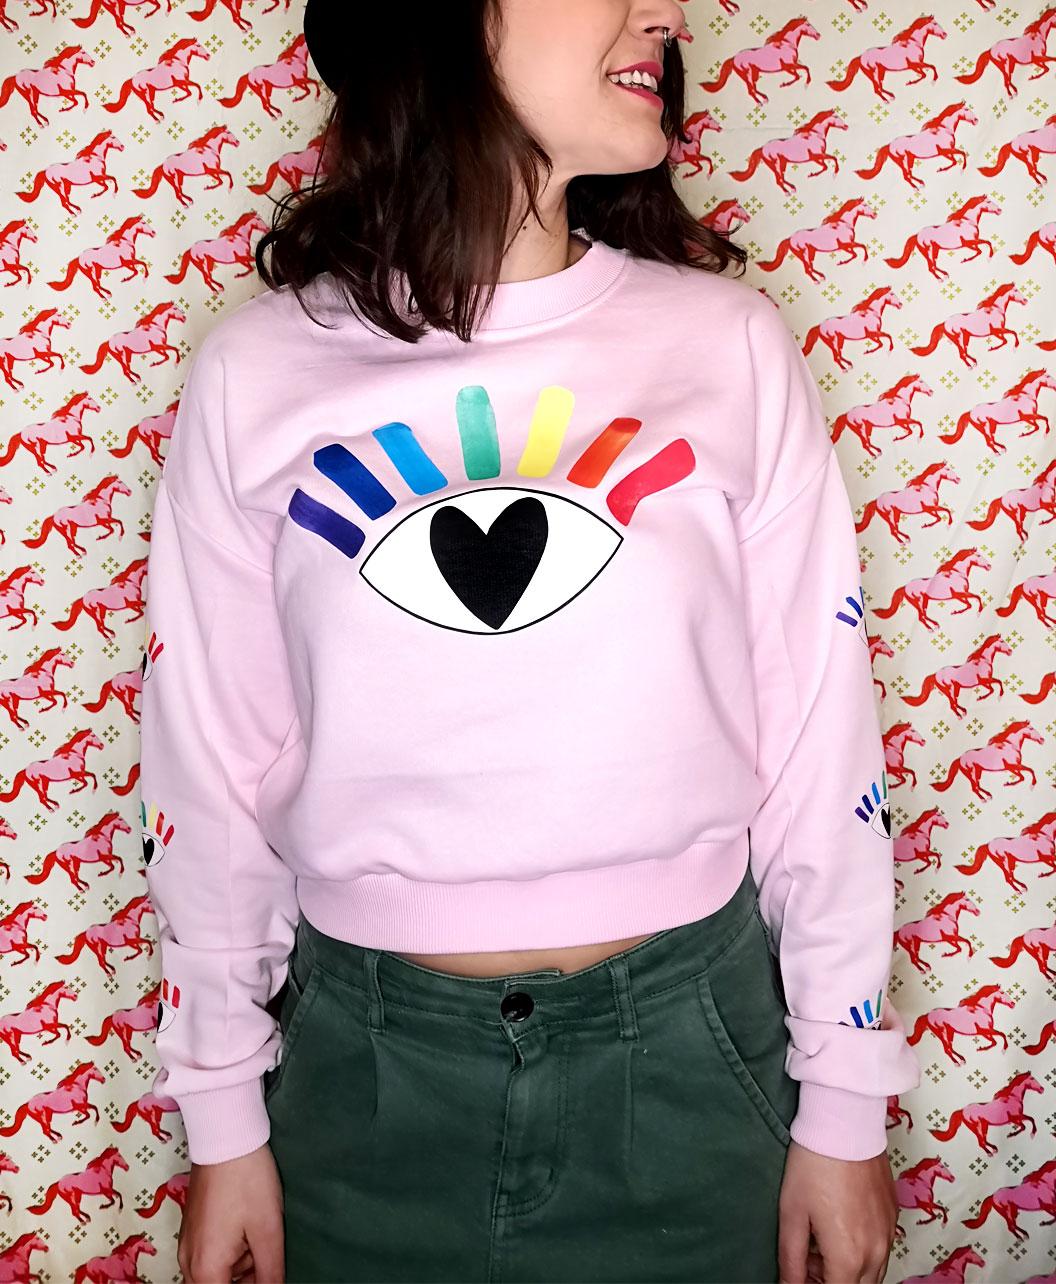 sudadera corta mujer light pink rosita original divertida ilustracion alternativa corazon ojo arcoiris